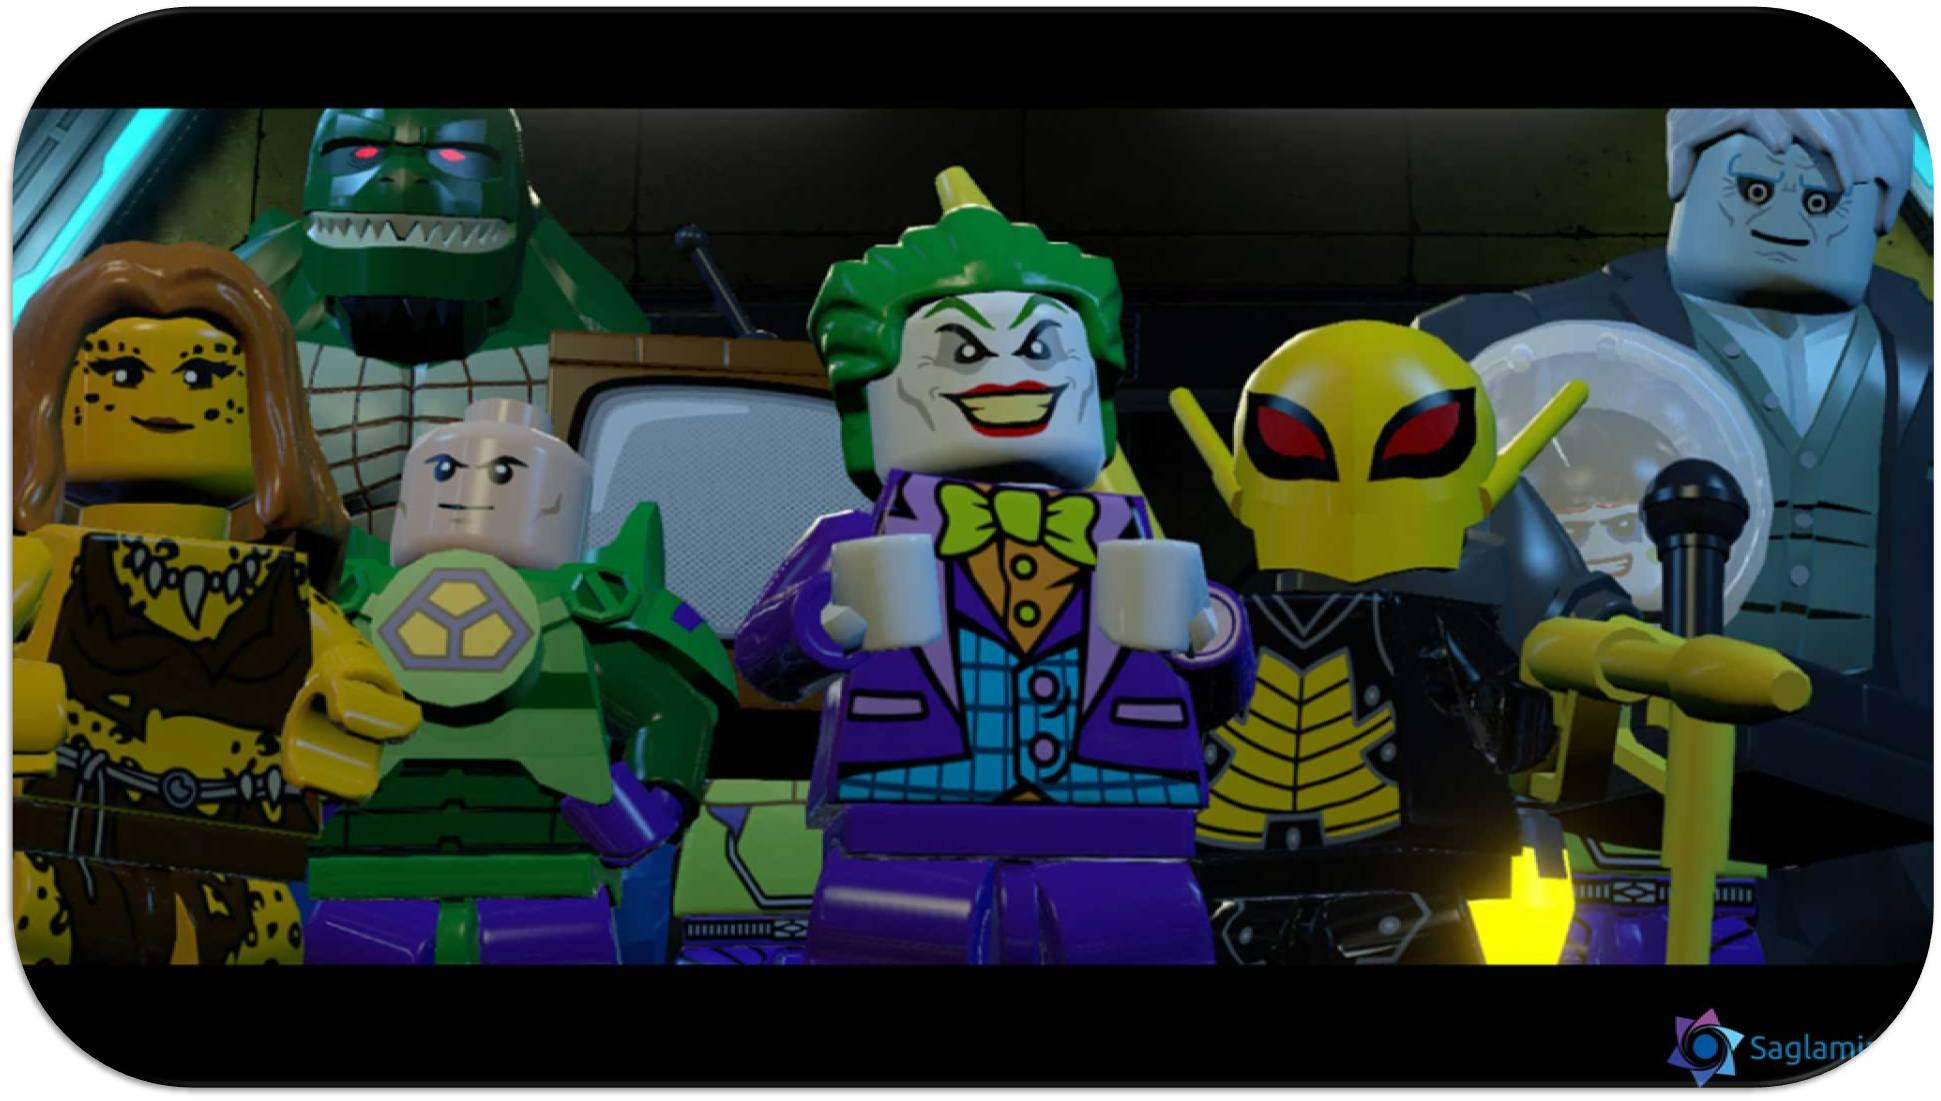 Lego Batman 3 Beyond Gotham saglamindir